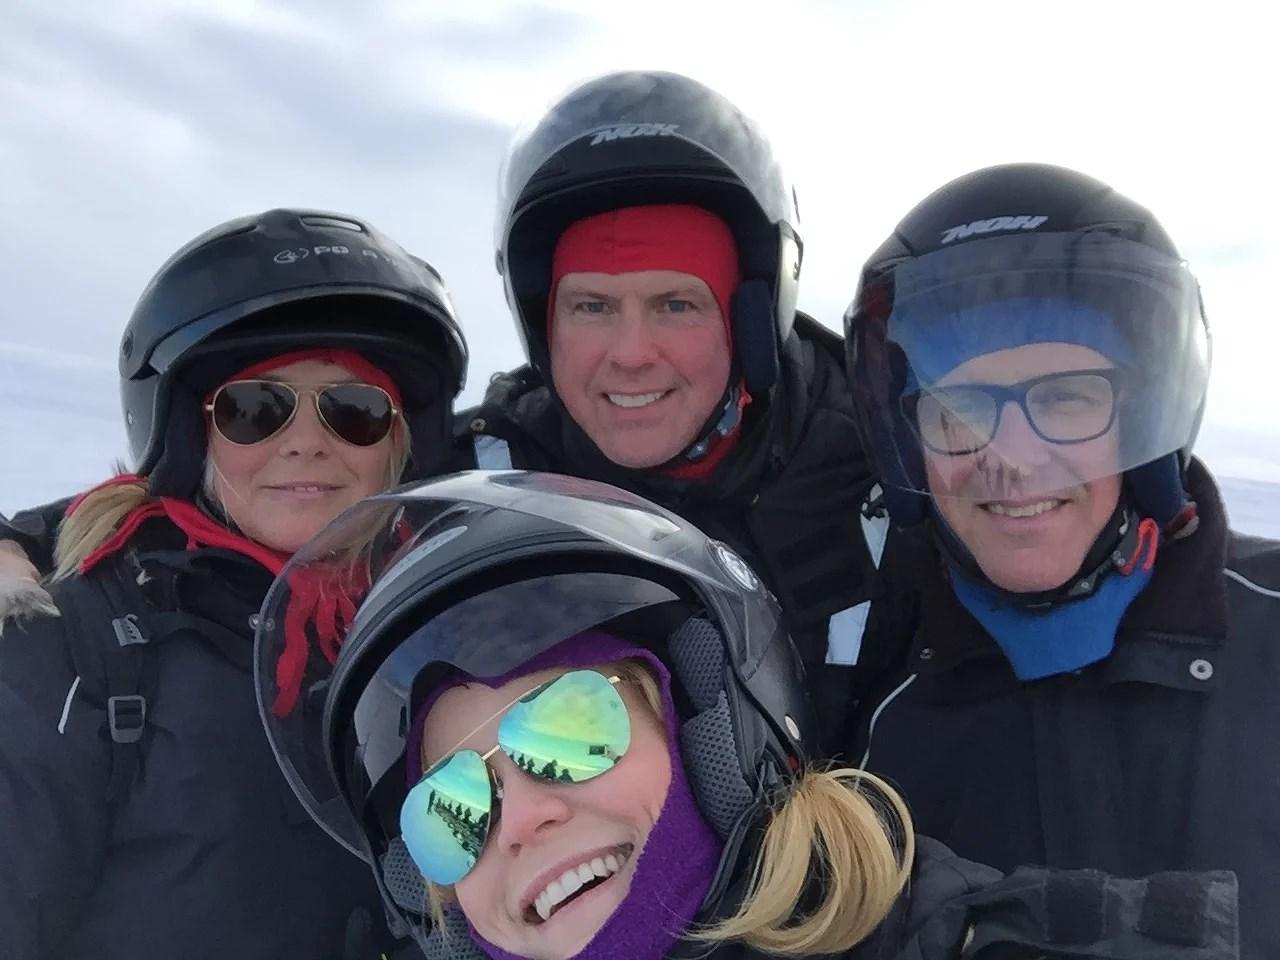 Inga, Sigge, Thomas og jeg. Vores Stop-over-buddy's